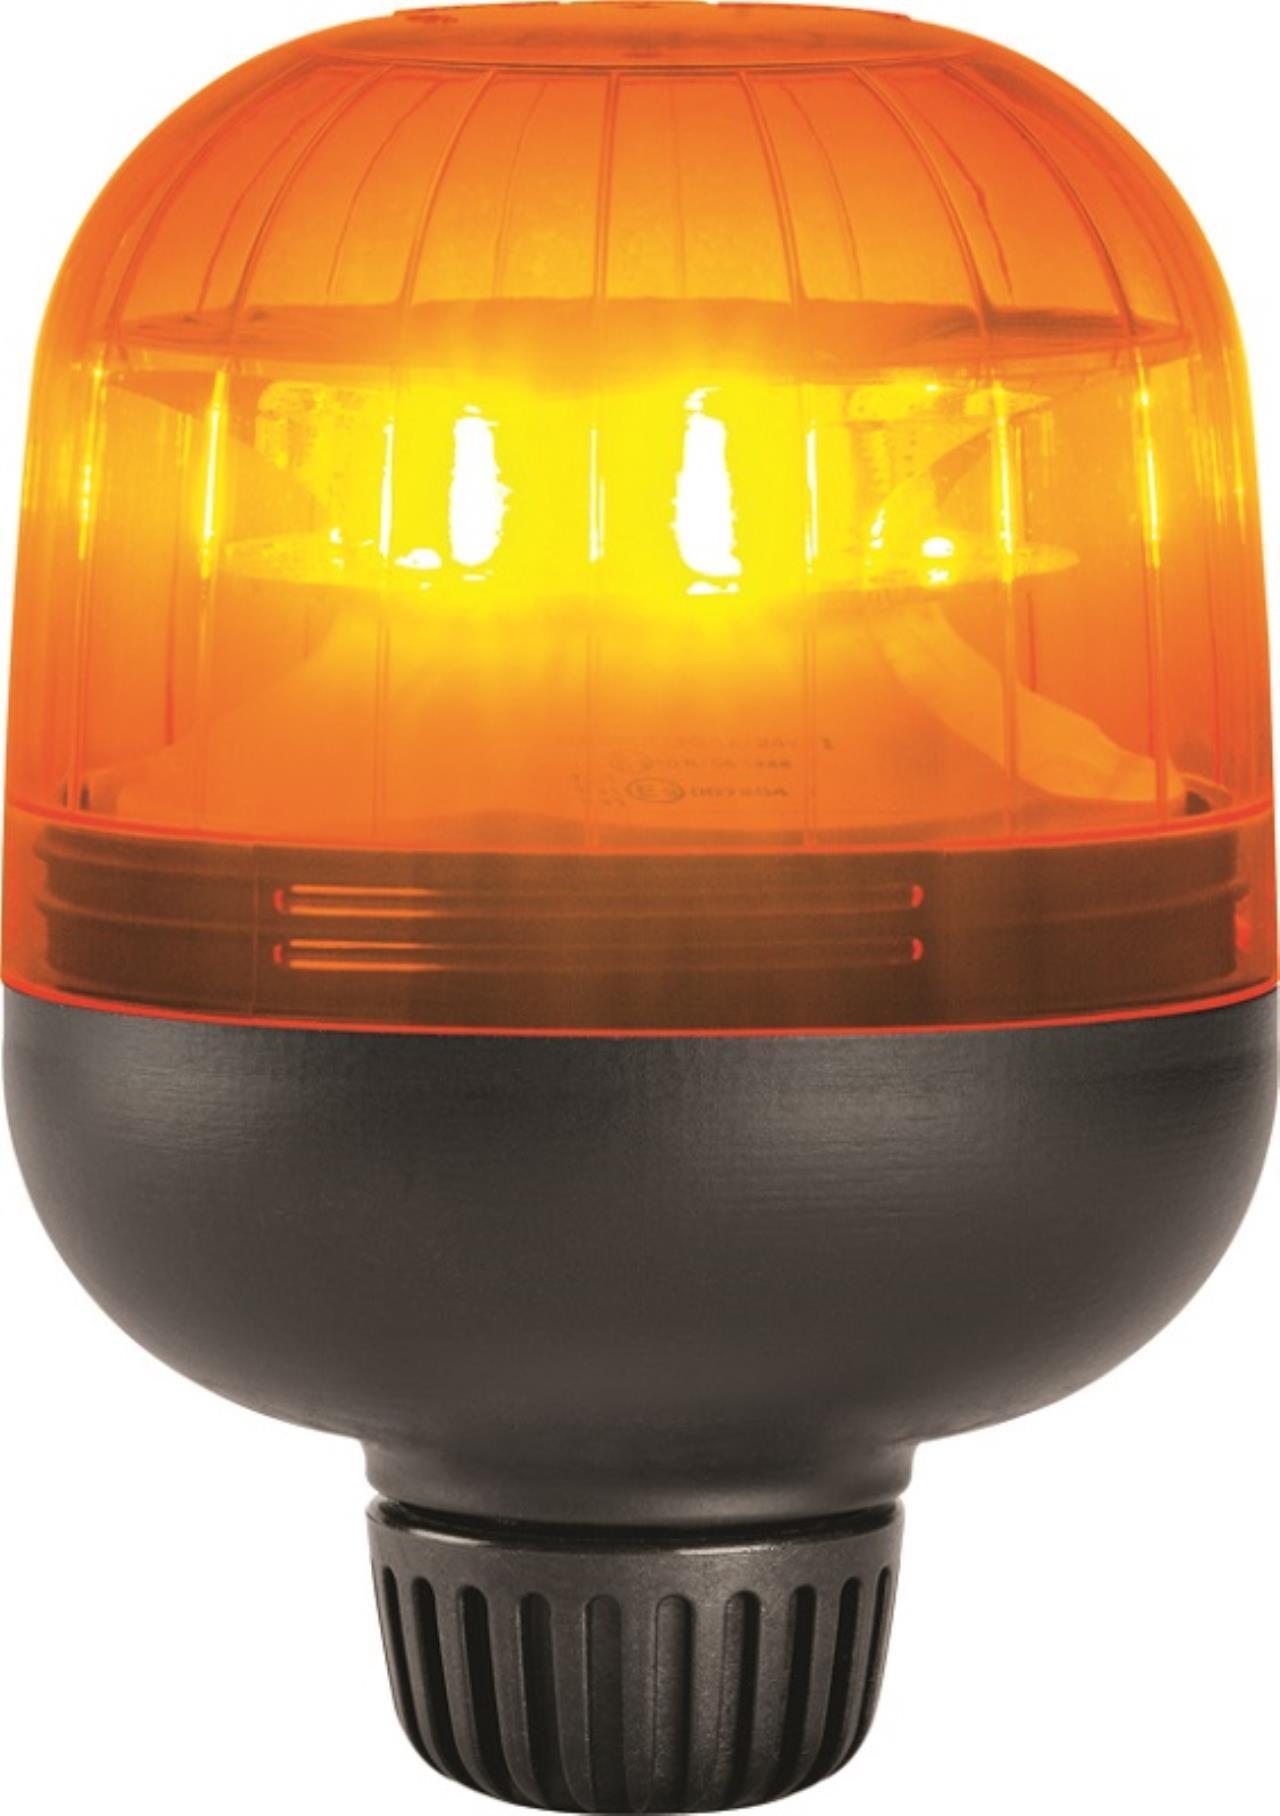 NH rotorblink LED 12-24V stikmontering